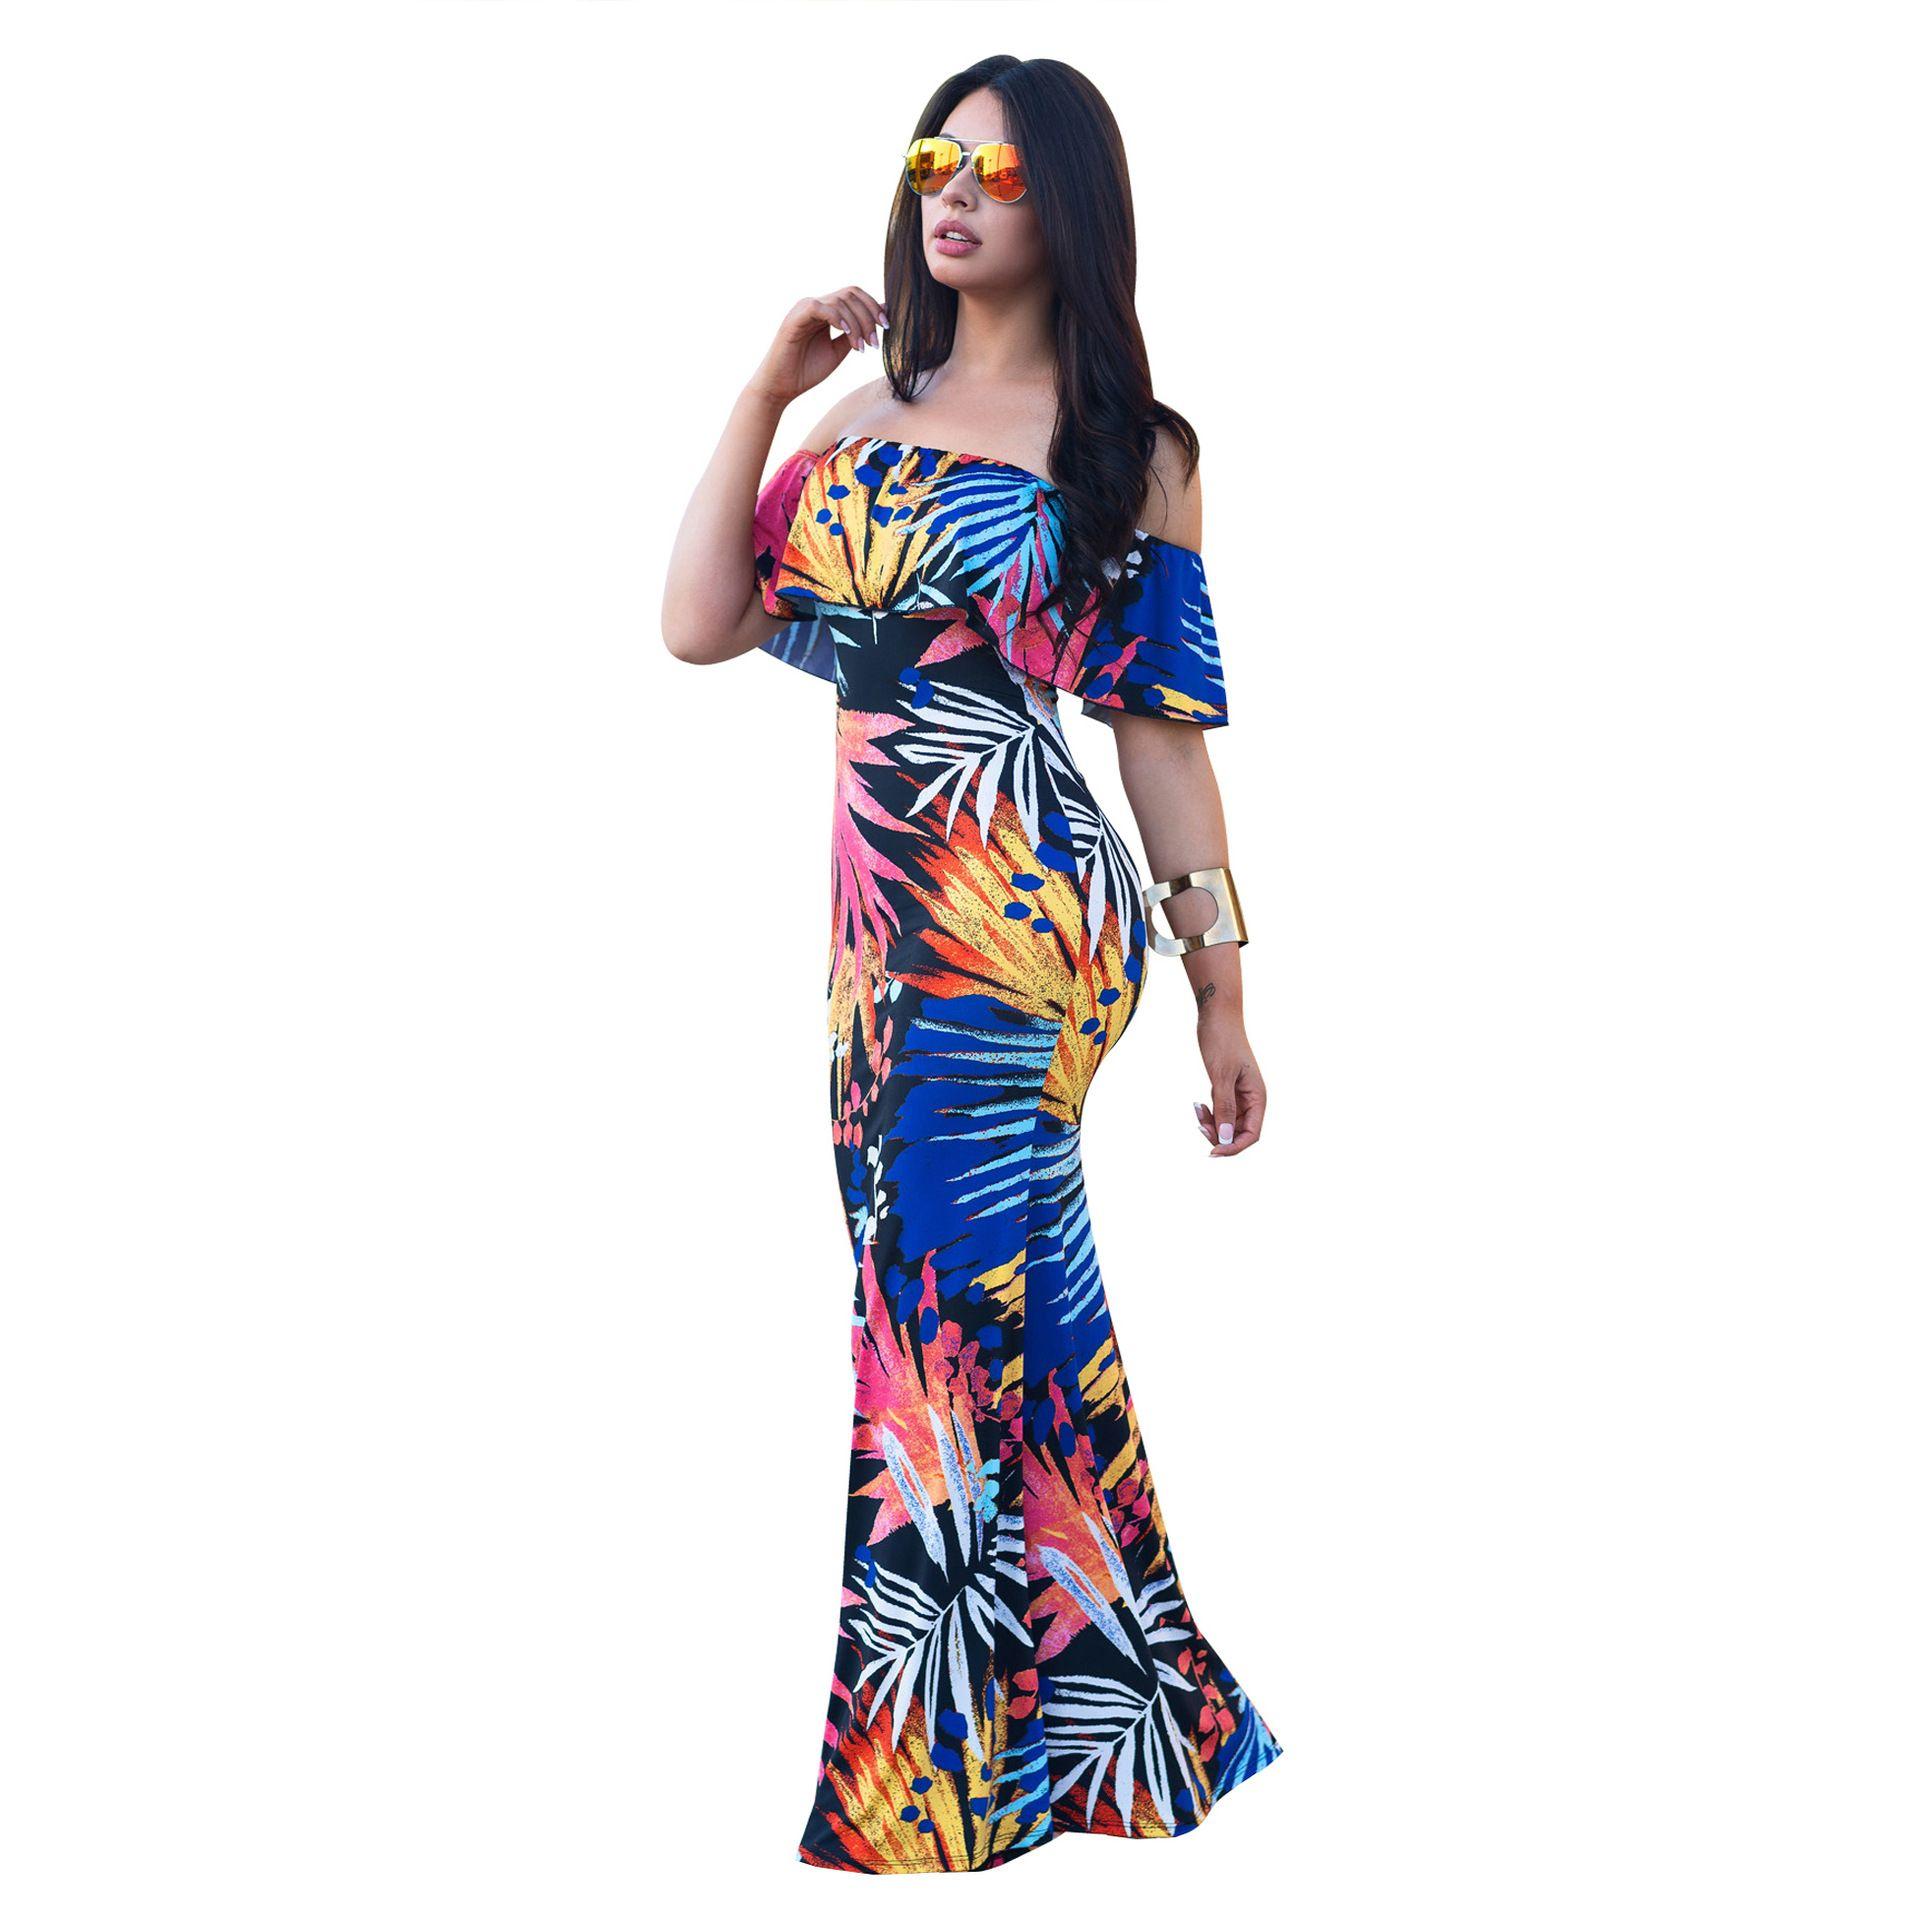 07f7711bcc6 Ruffles Off Shoulder Floral Printed Women Summer Casual Slash Neck ...